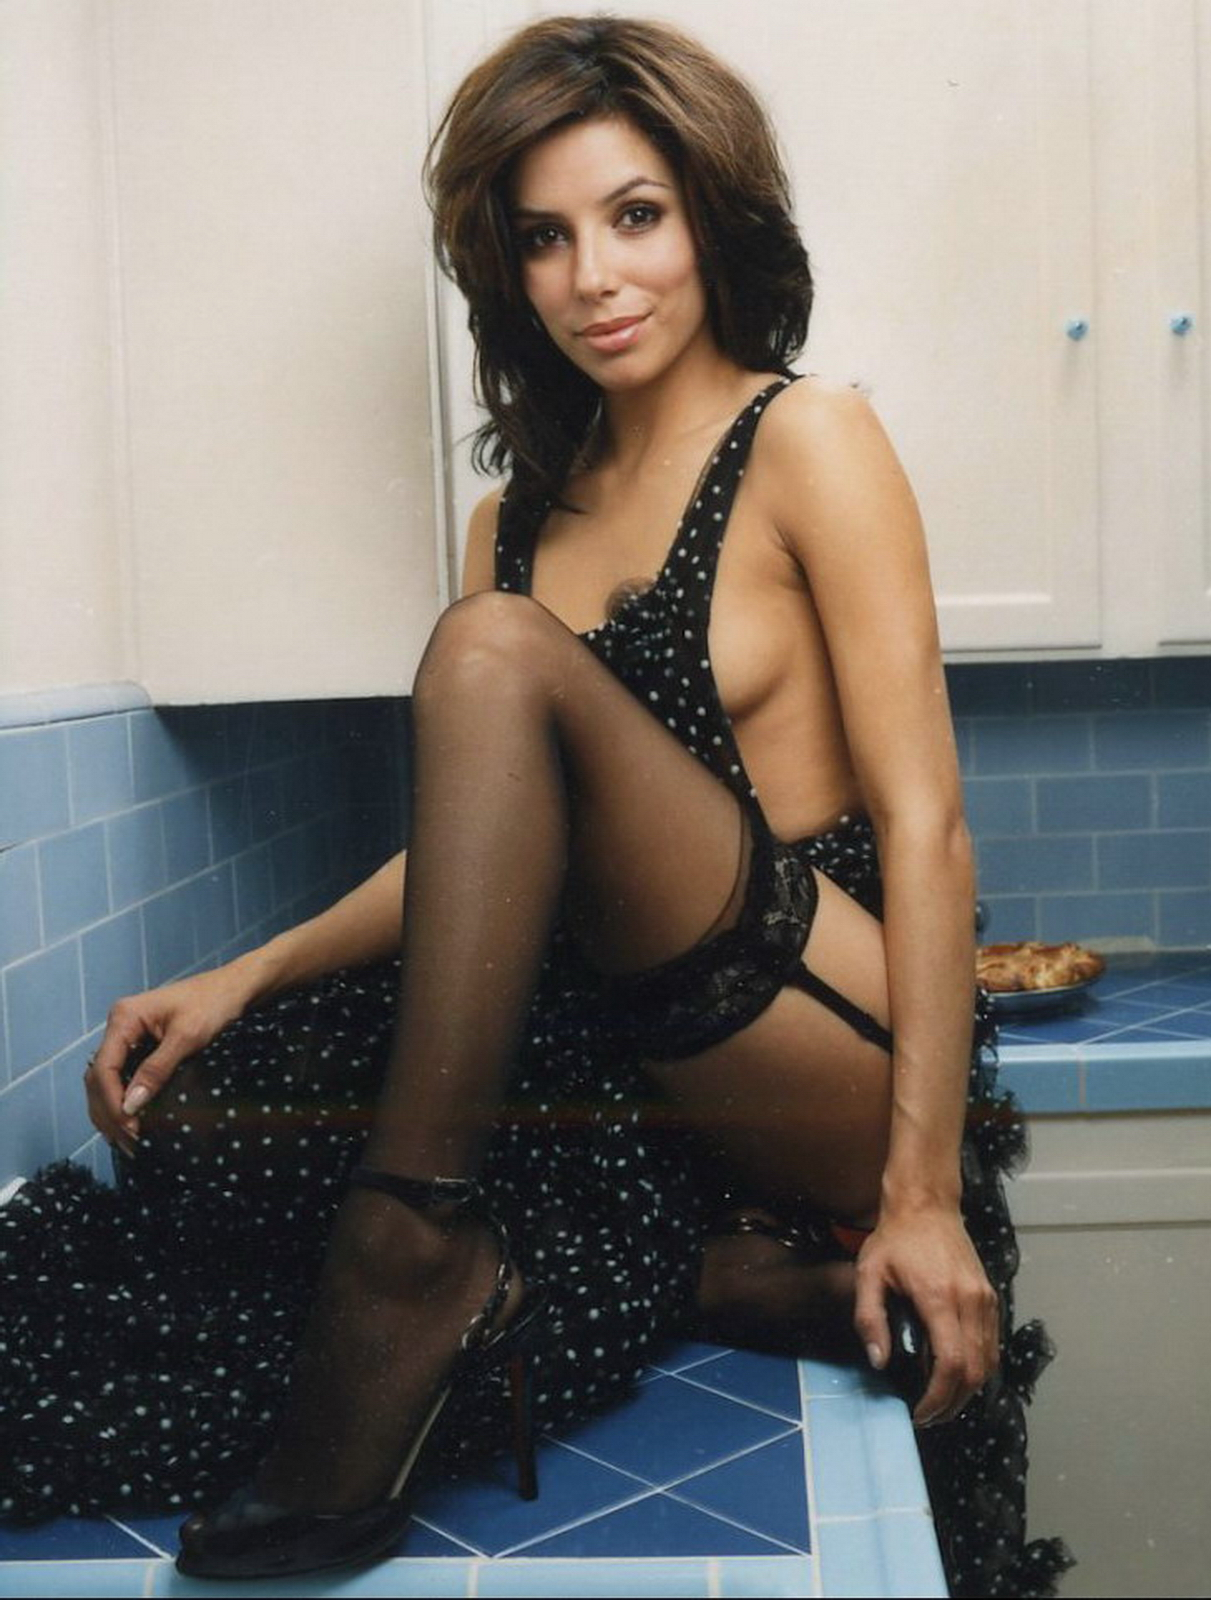 Memek Plus: Eva Longoria Esquire sexy touch herself see ...